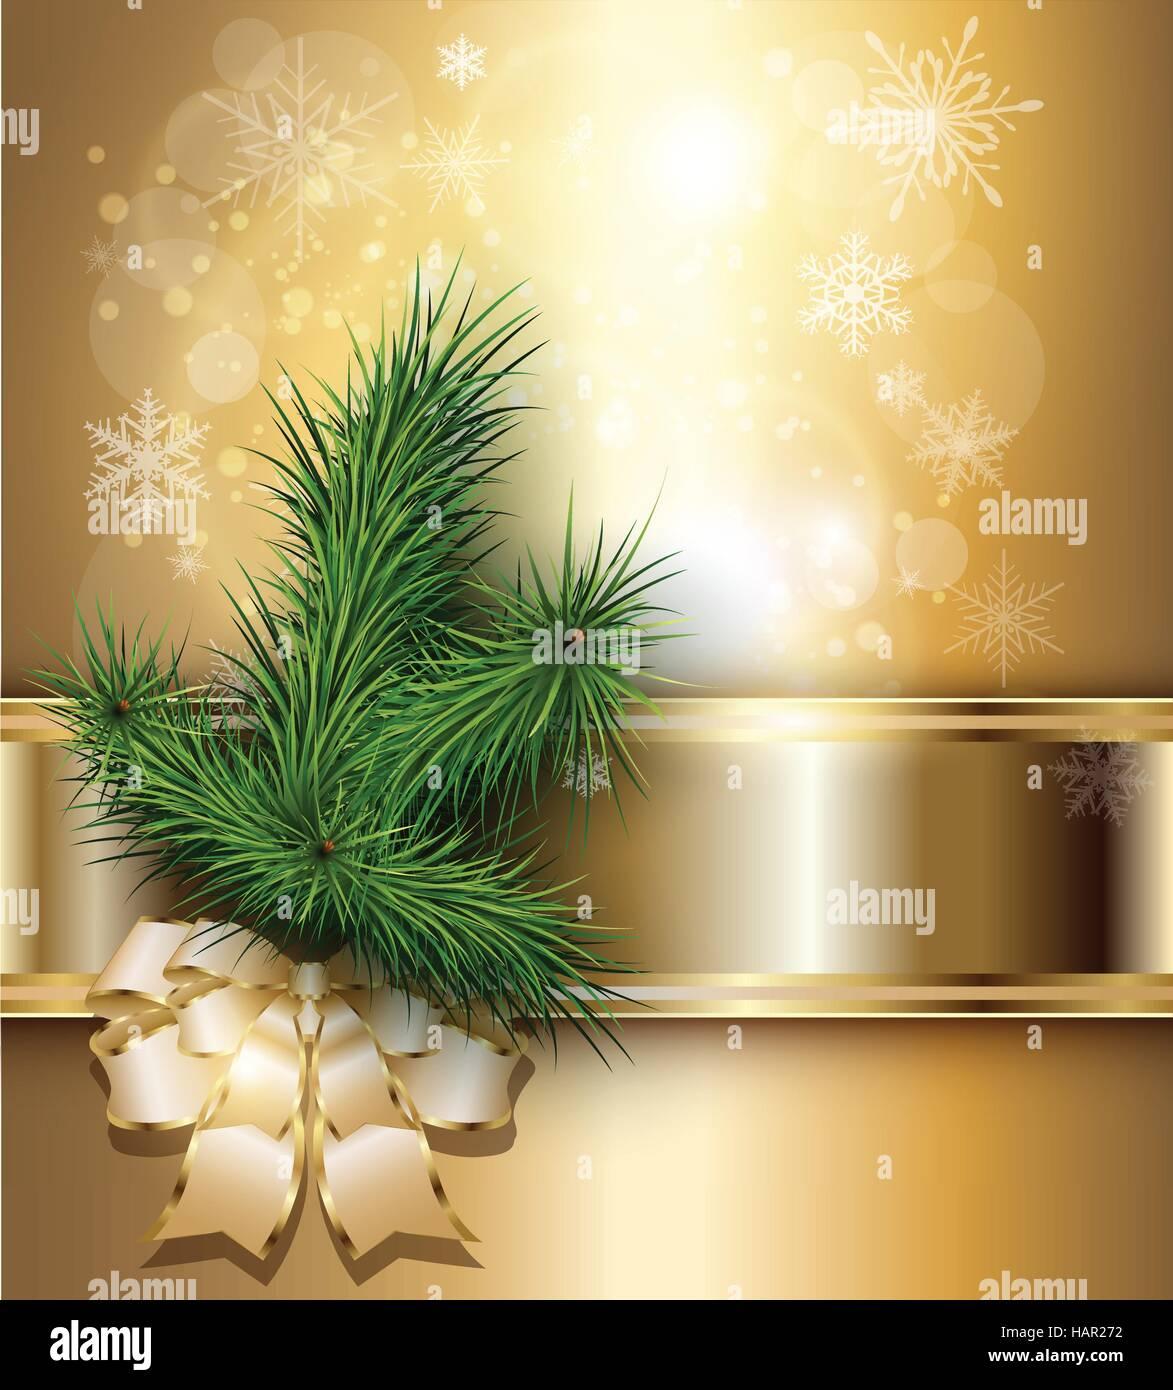 Elegant Christmas Background Hd.Christmas Background With Elegant Gold Banner Christmas